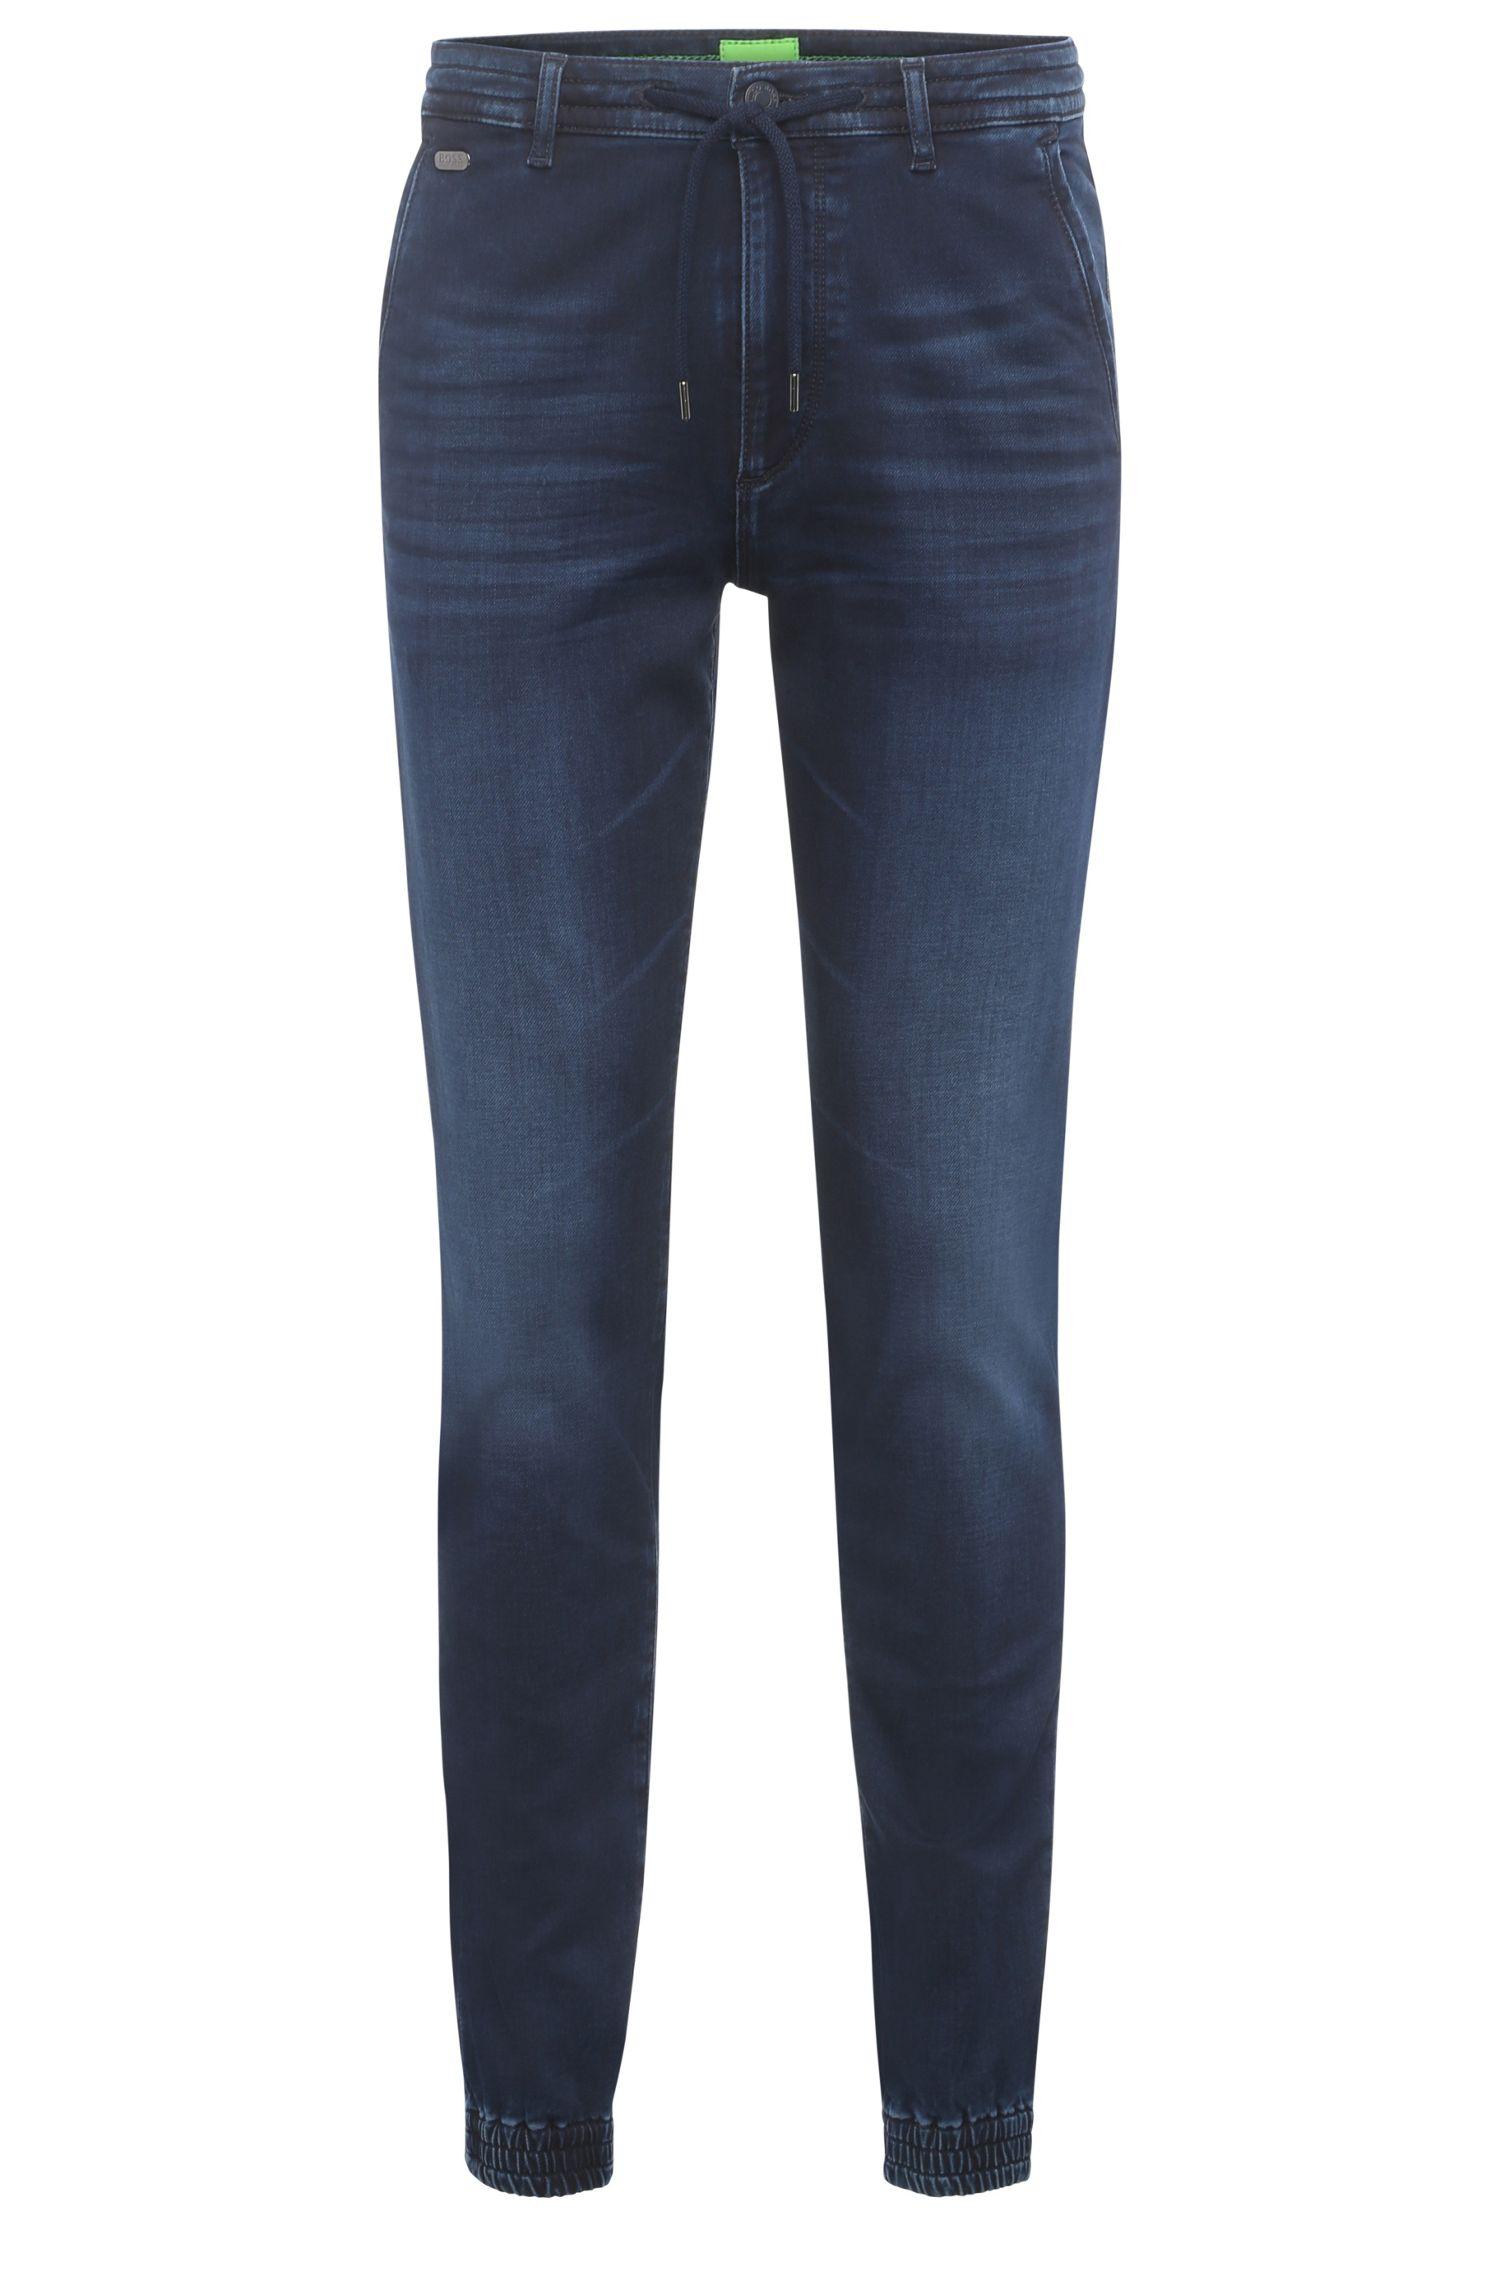 'Darrel'   Slim Fit, 9.75 oz Stretch Cotton Denim Jogging Pants